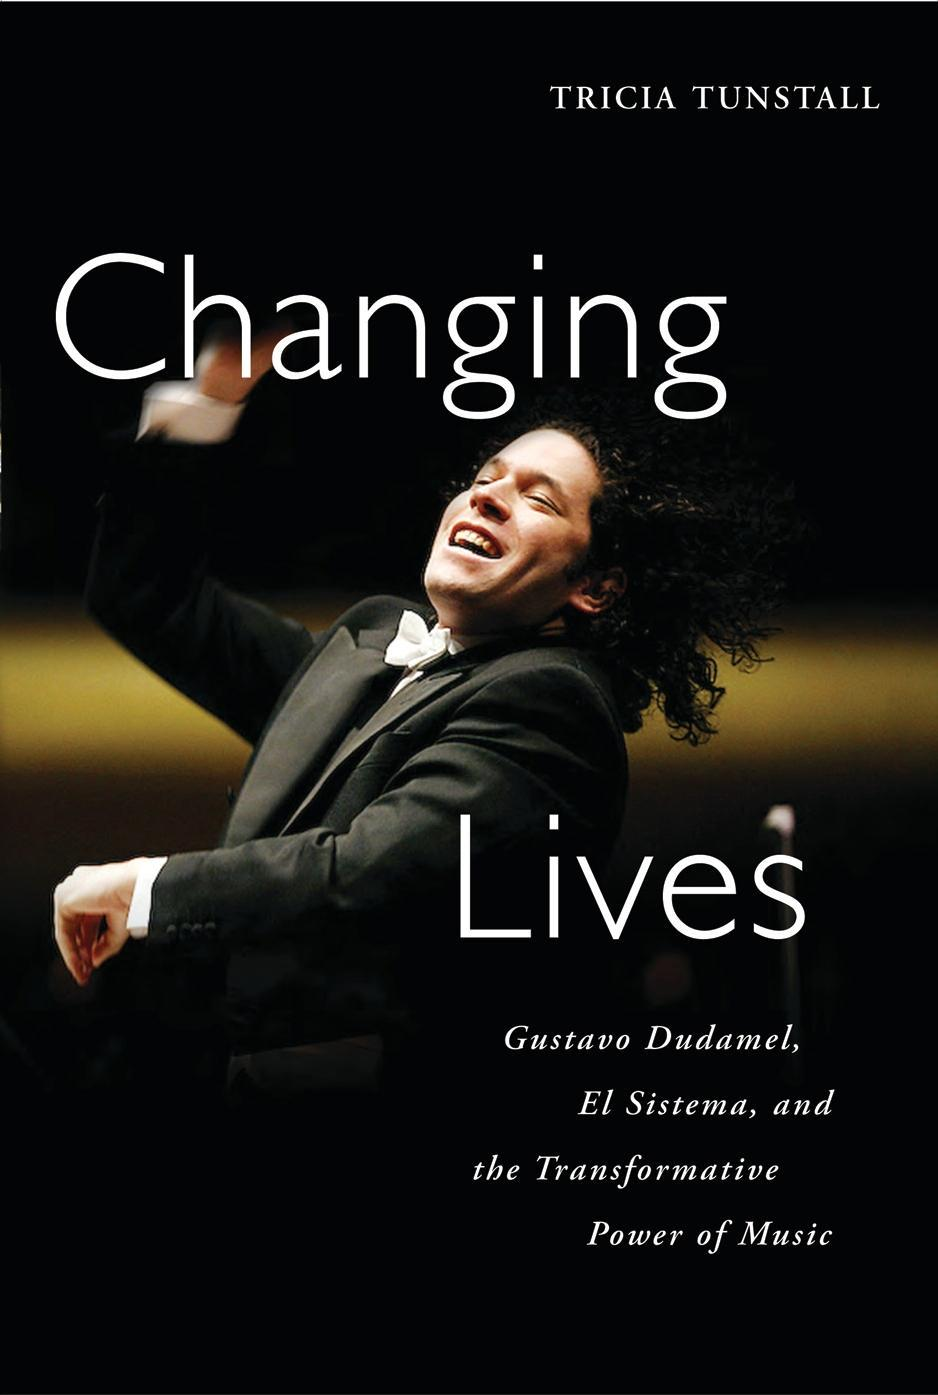 Gustavo Dudamel's quote #7